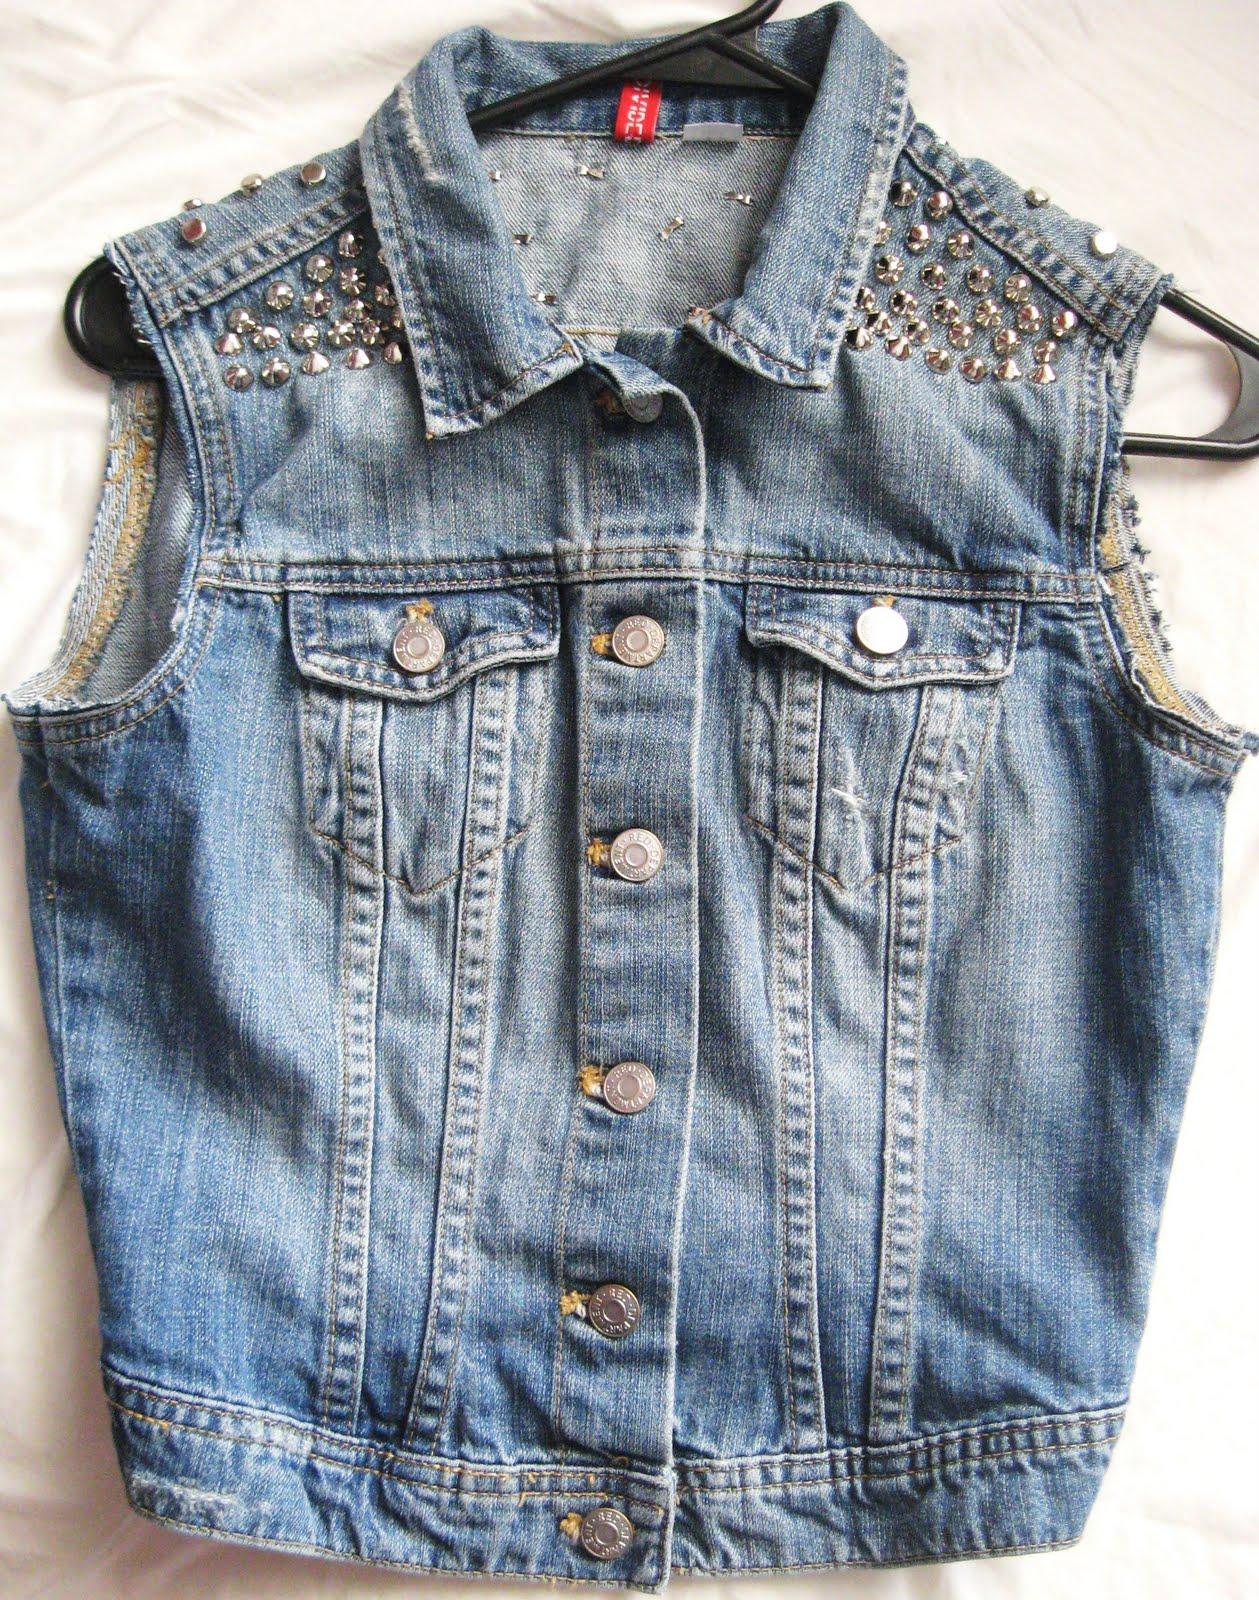 Denim Jackets For Women Outfits Wallpaper Hd